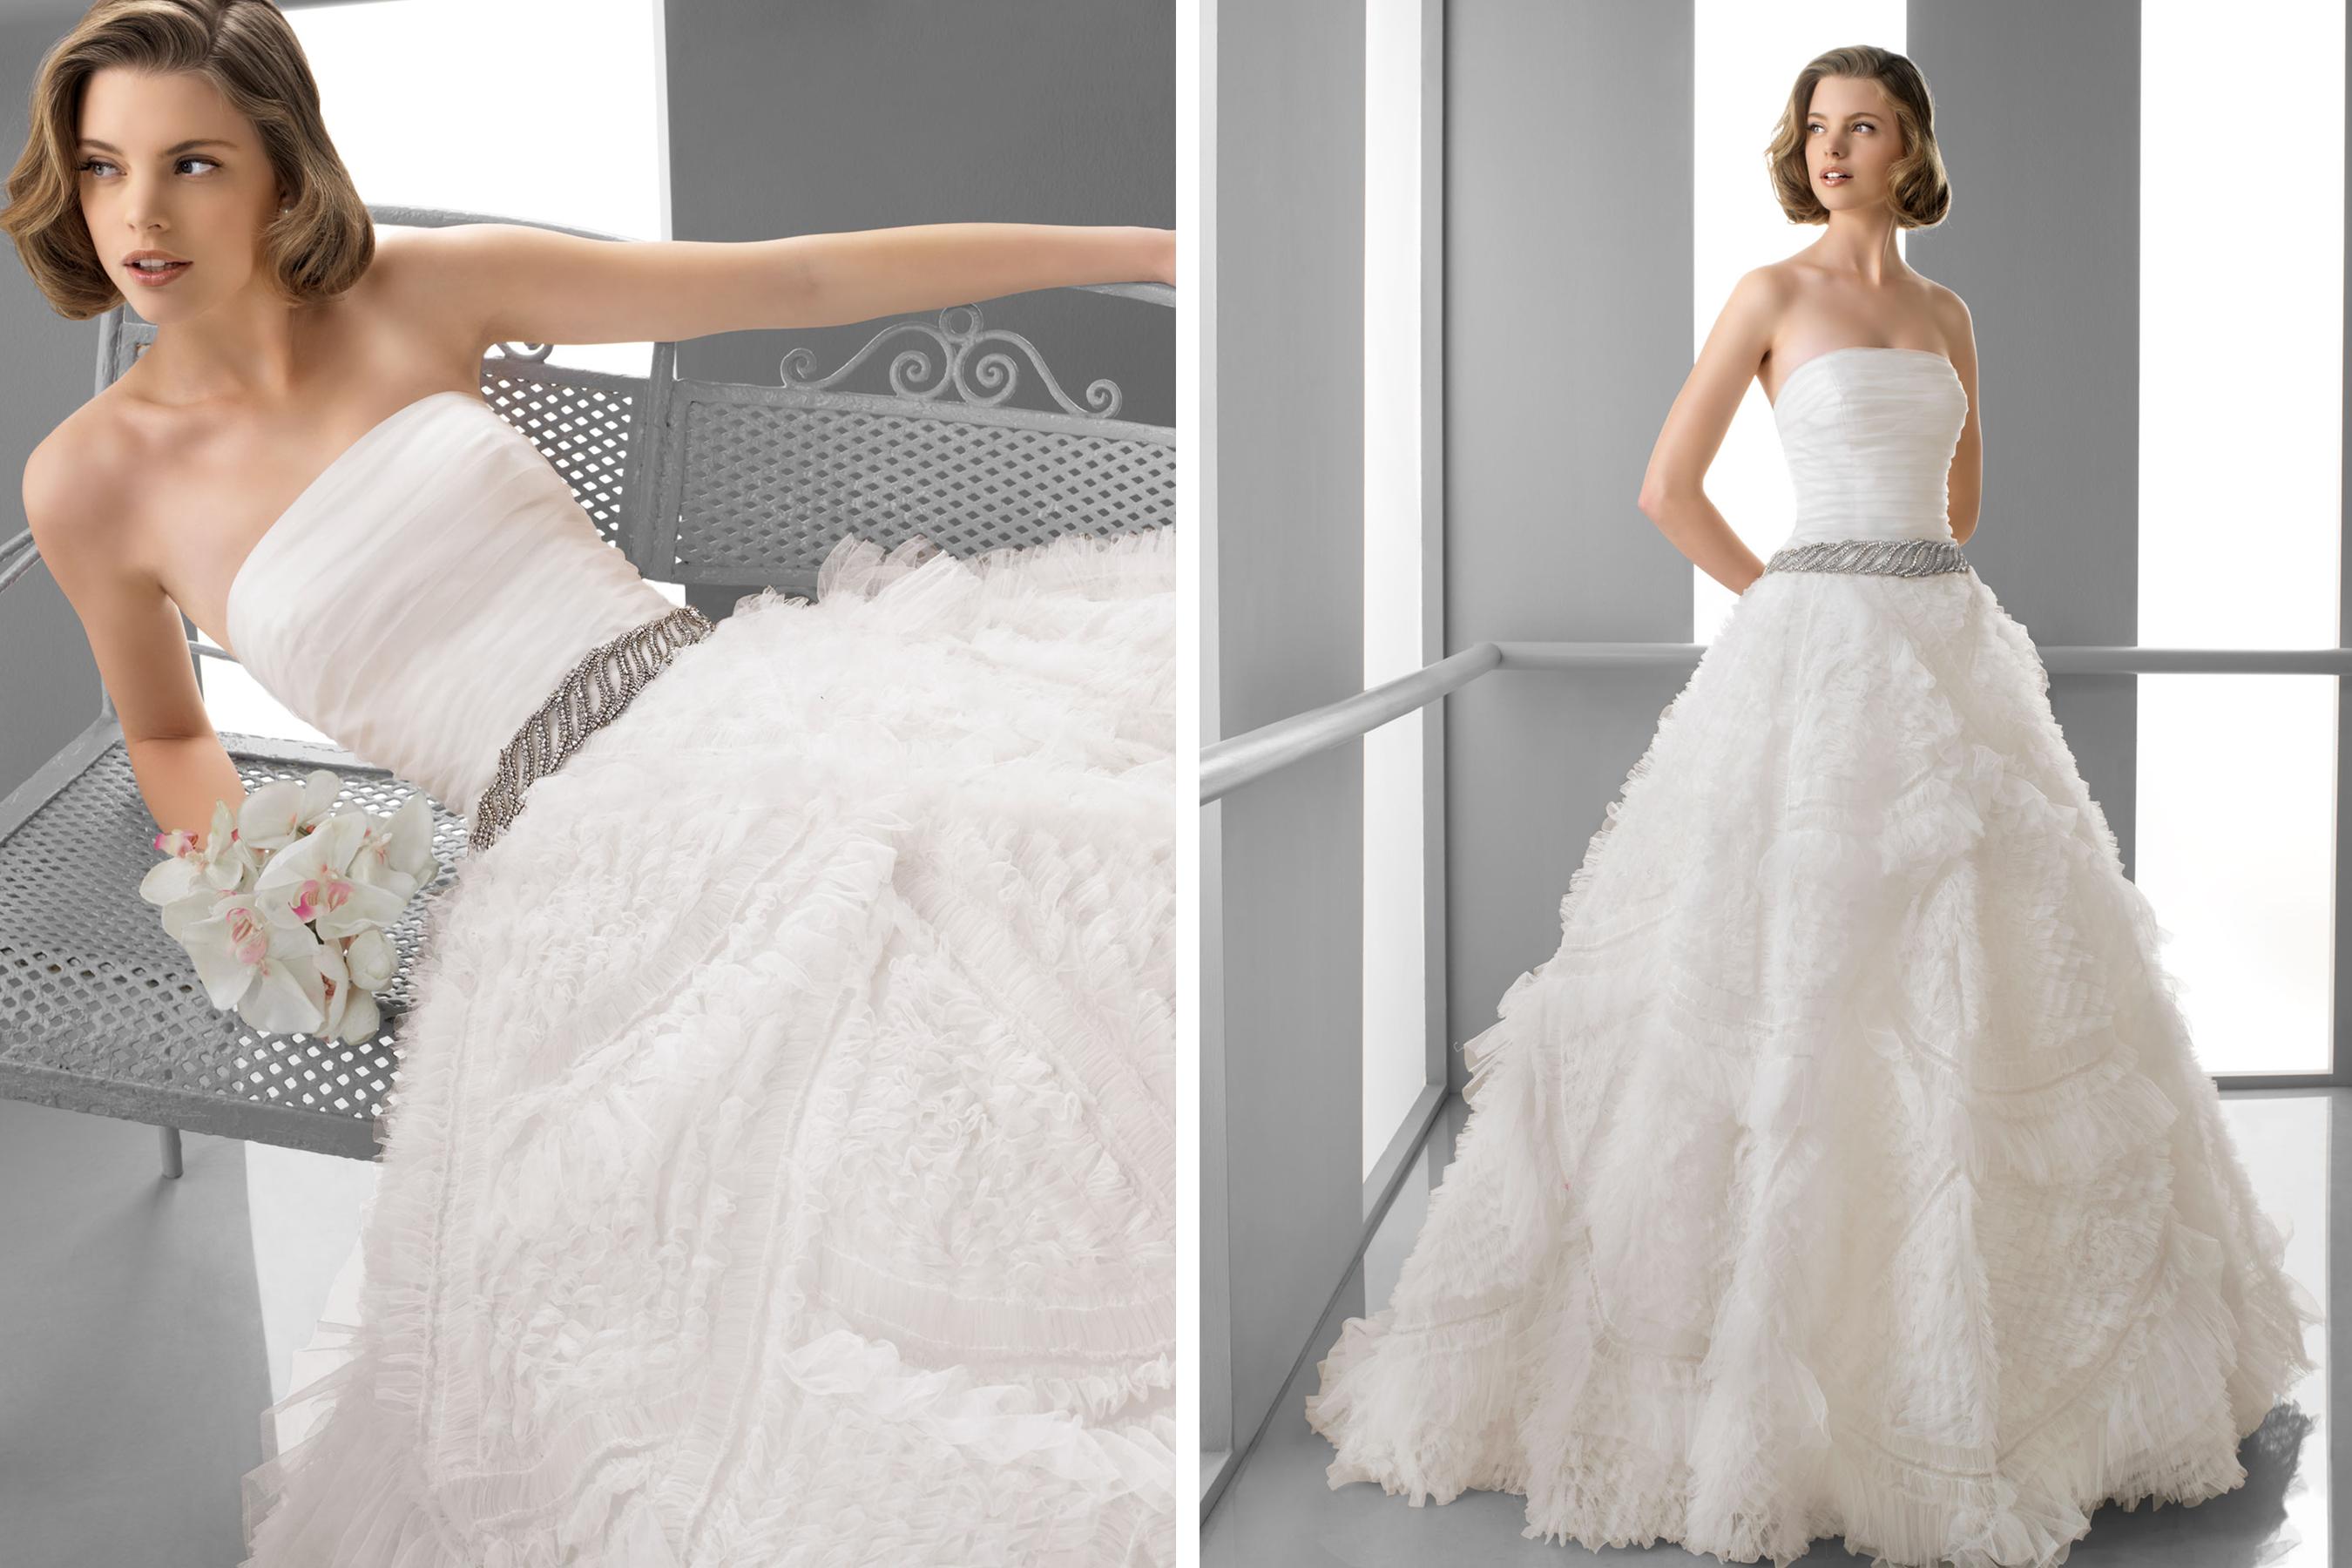 Alma novia wedding dress 2013 bridal futuro for Alma novia wedding dress